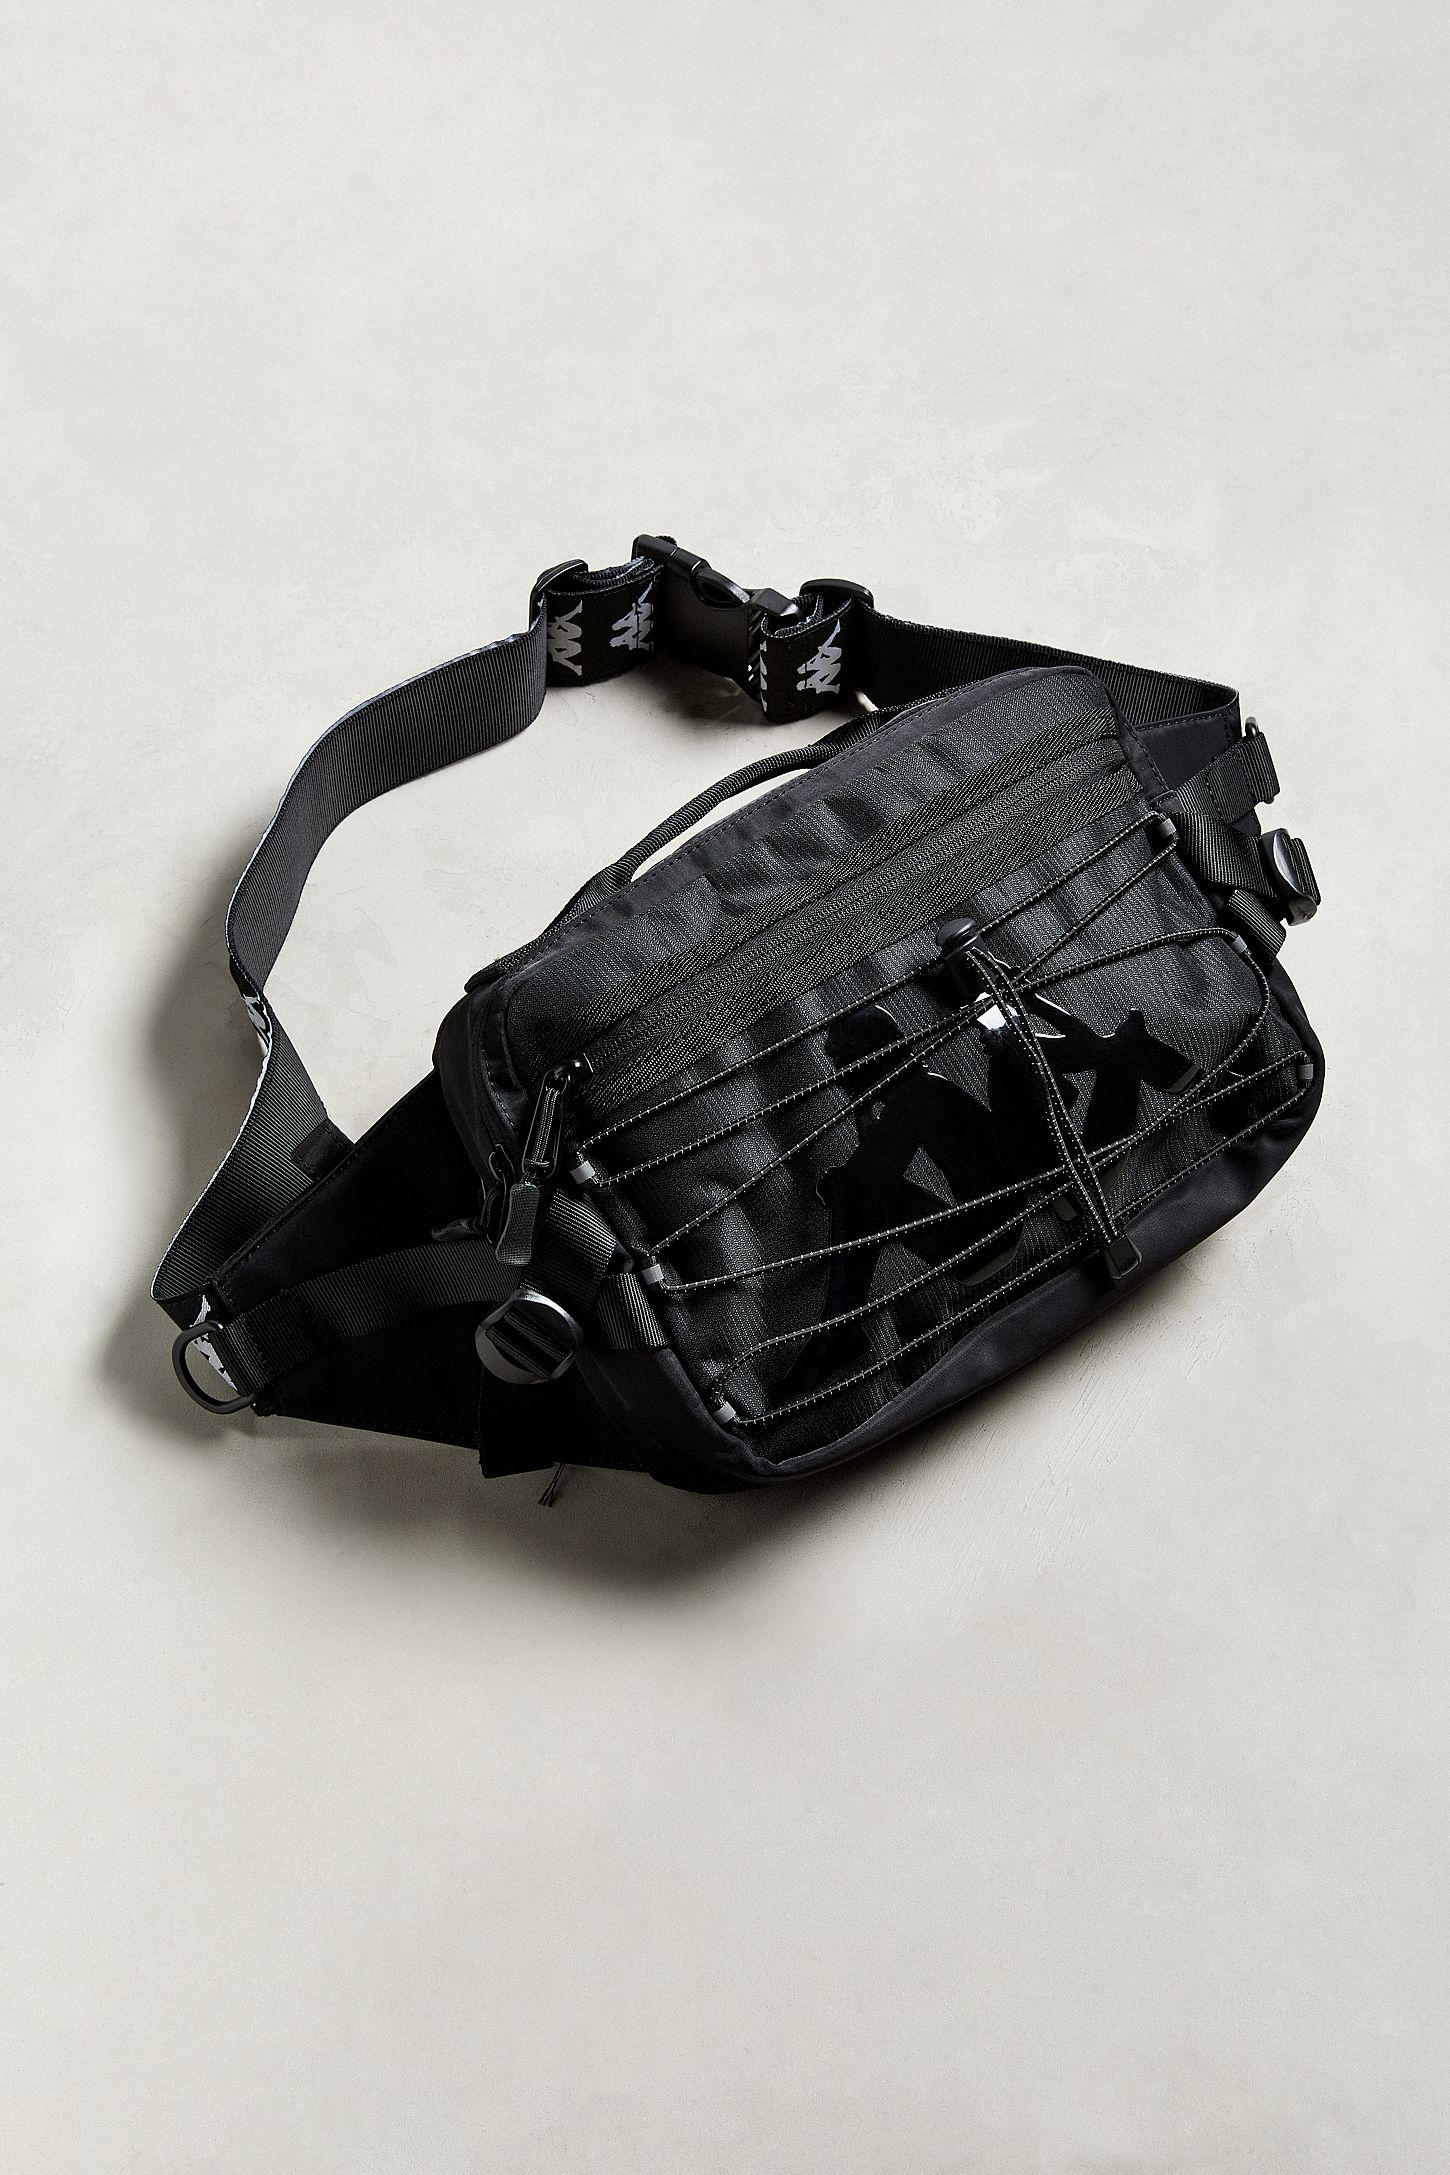 a5f7e705d4 Kappa Premium Sling Bag